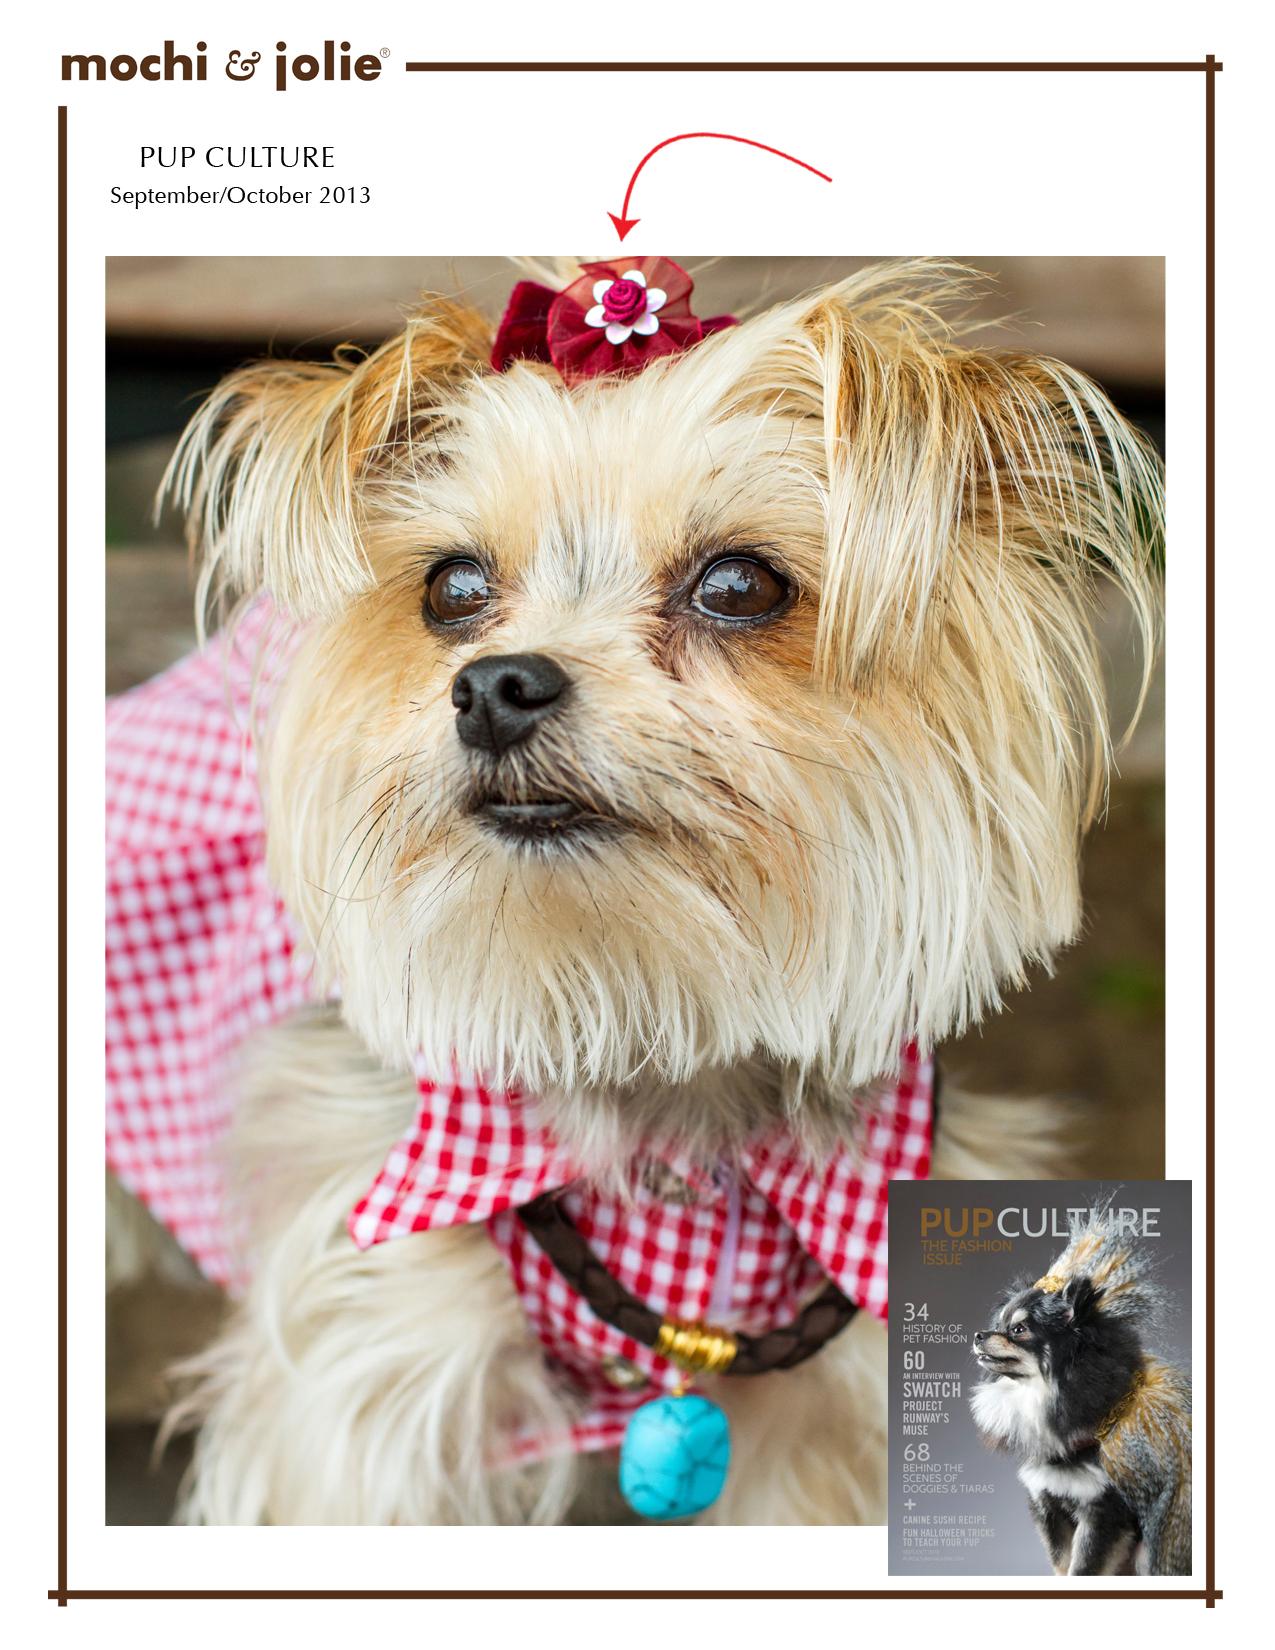 Pup Culture (September/October 2013)